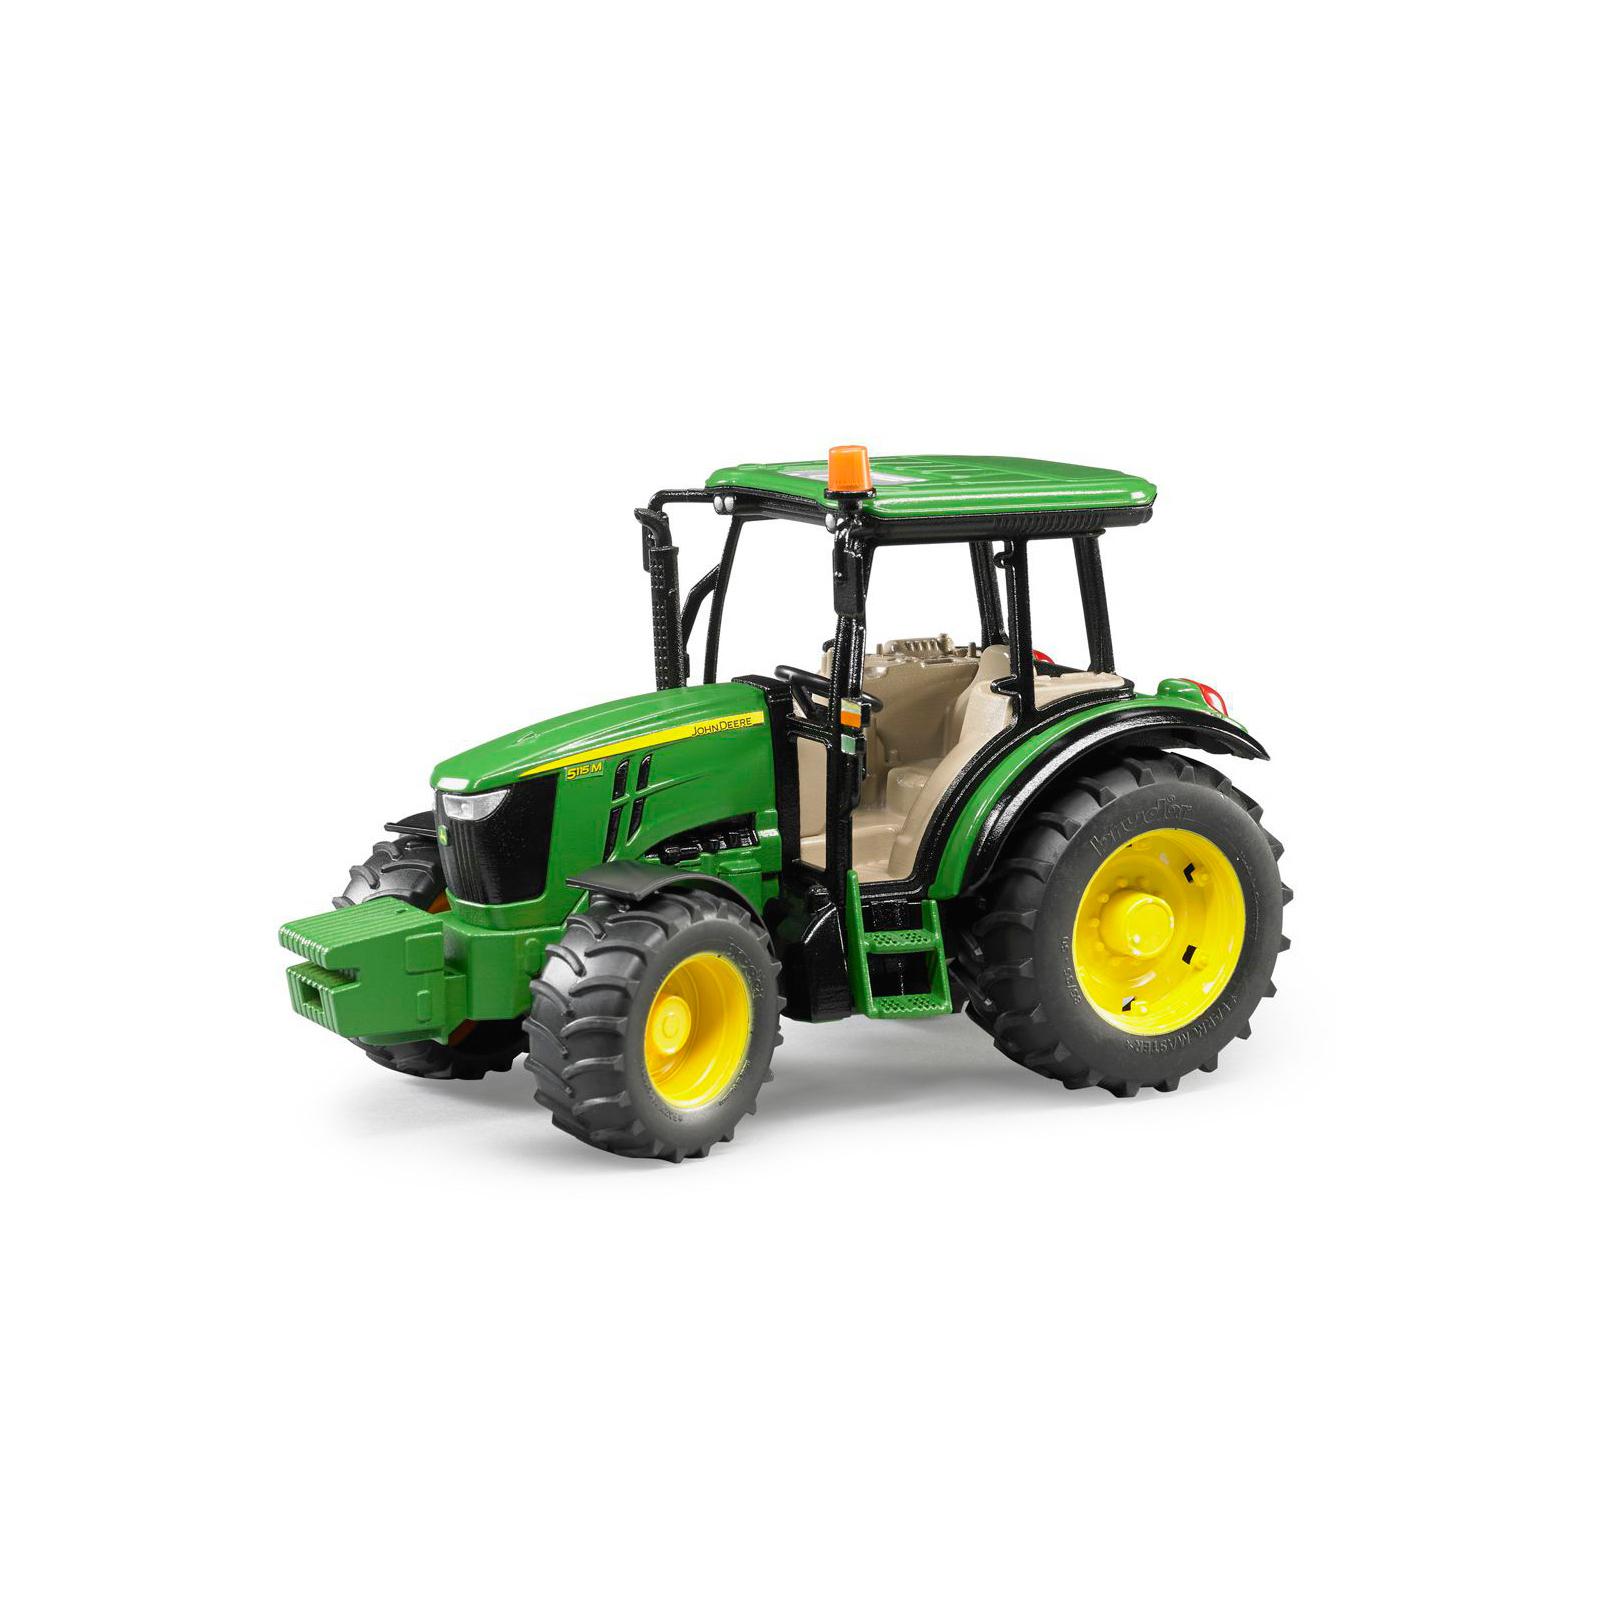 Спецтехника Bruder Трактор John Deere 5115M (02106)